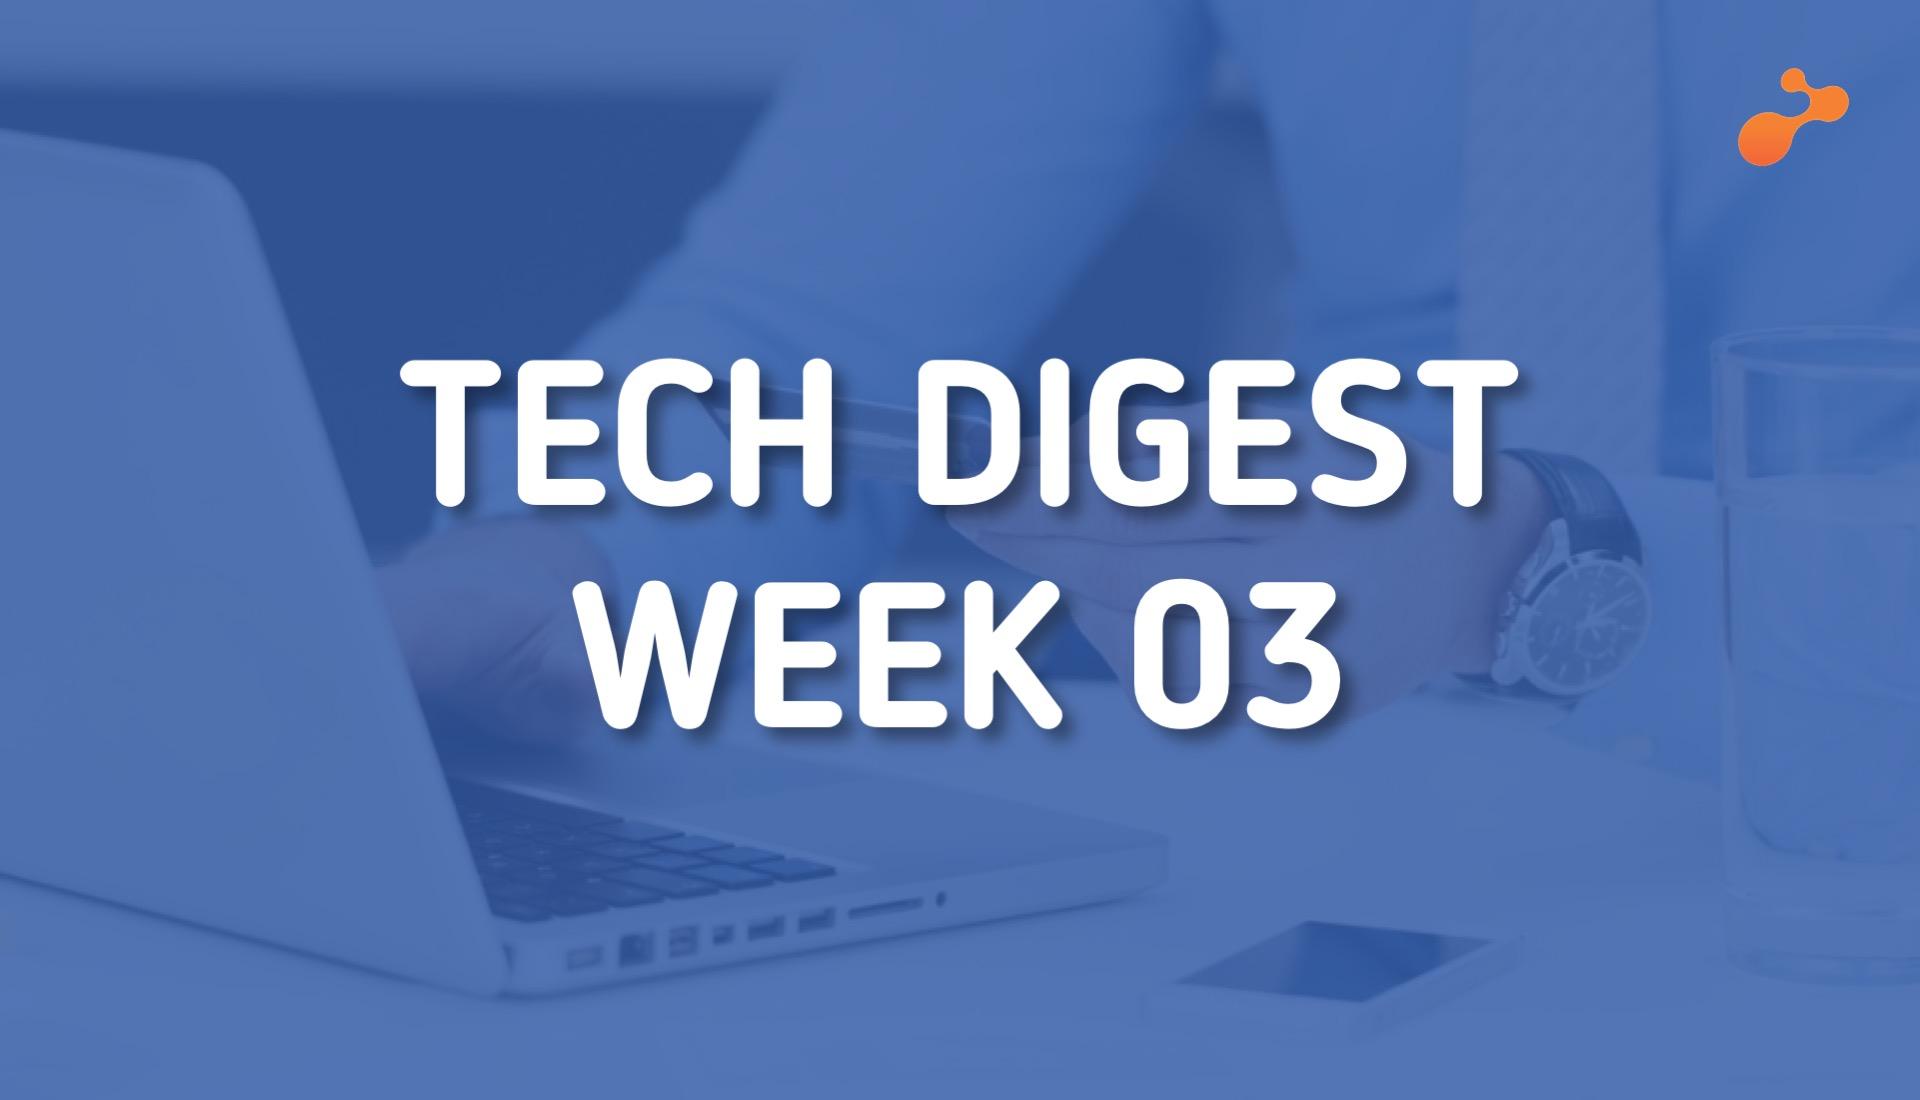 Technology news around the world - Week 03, 2019